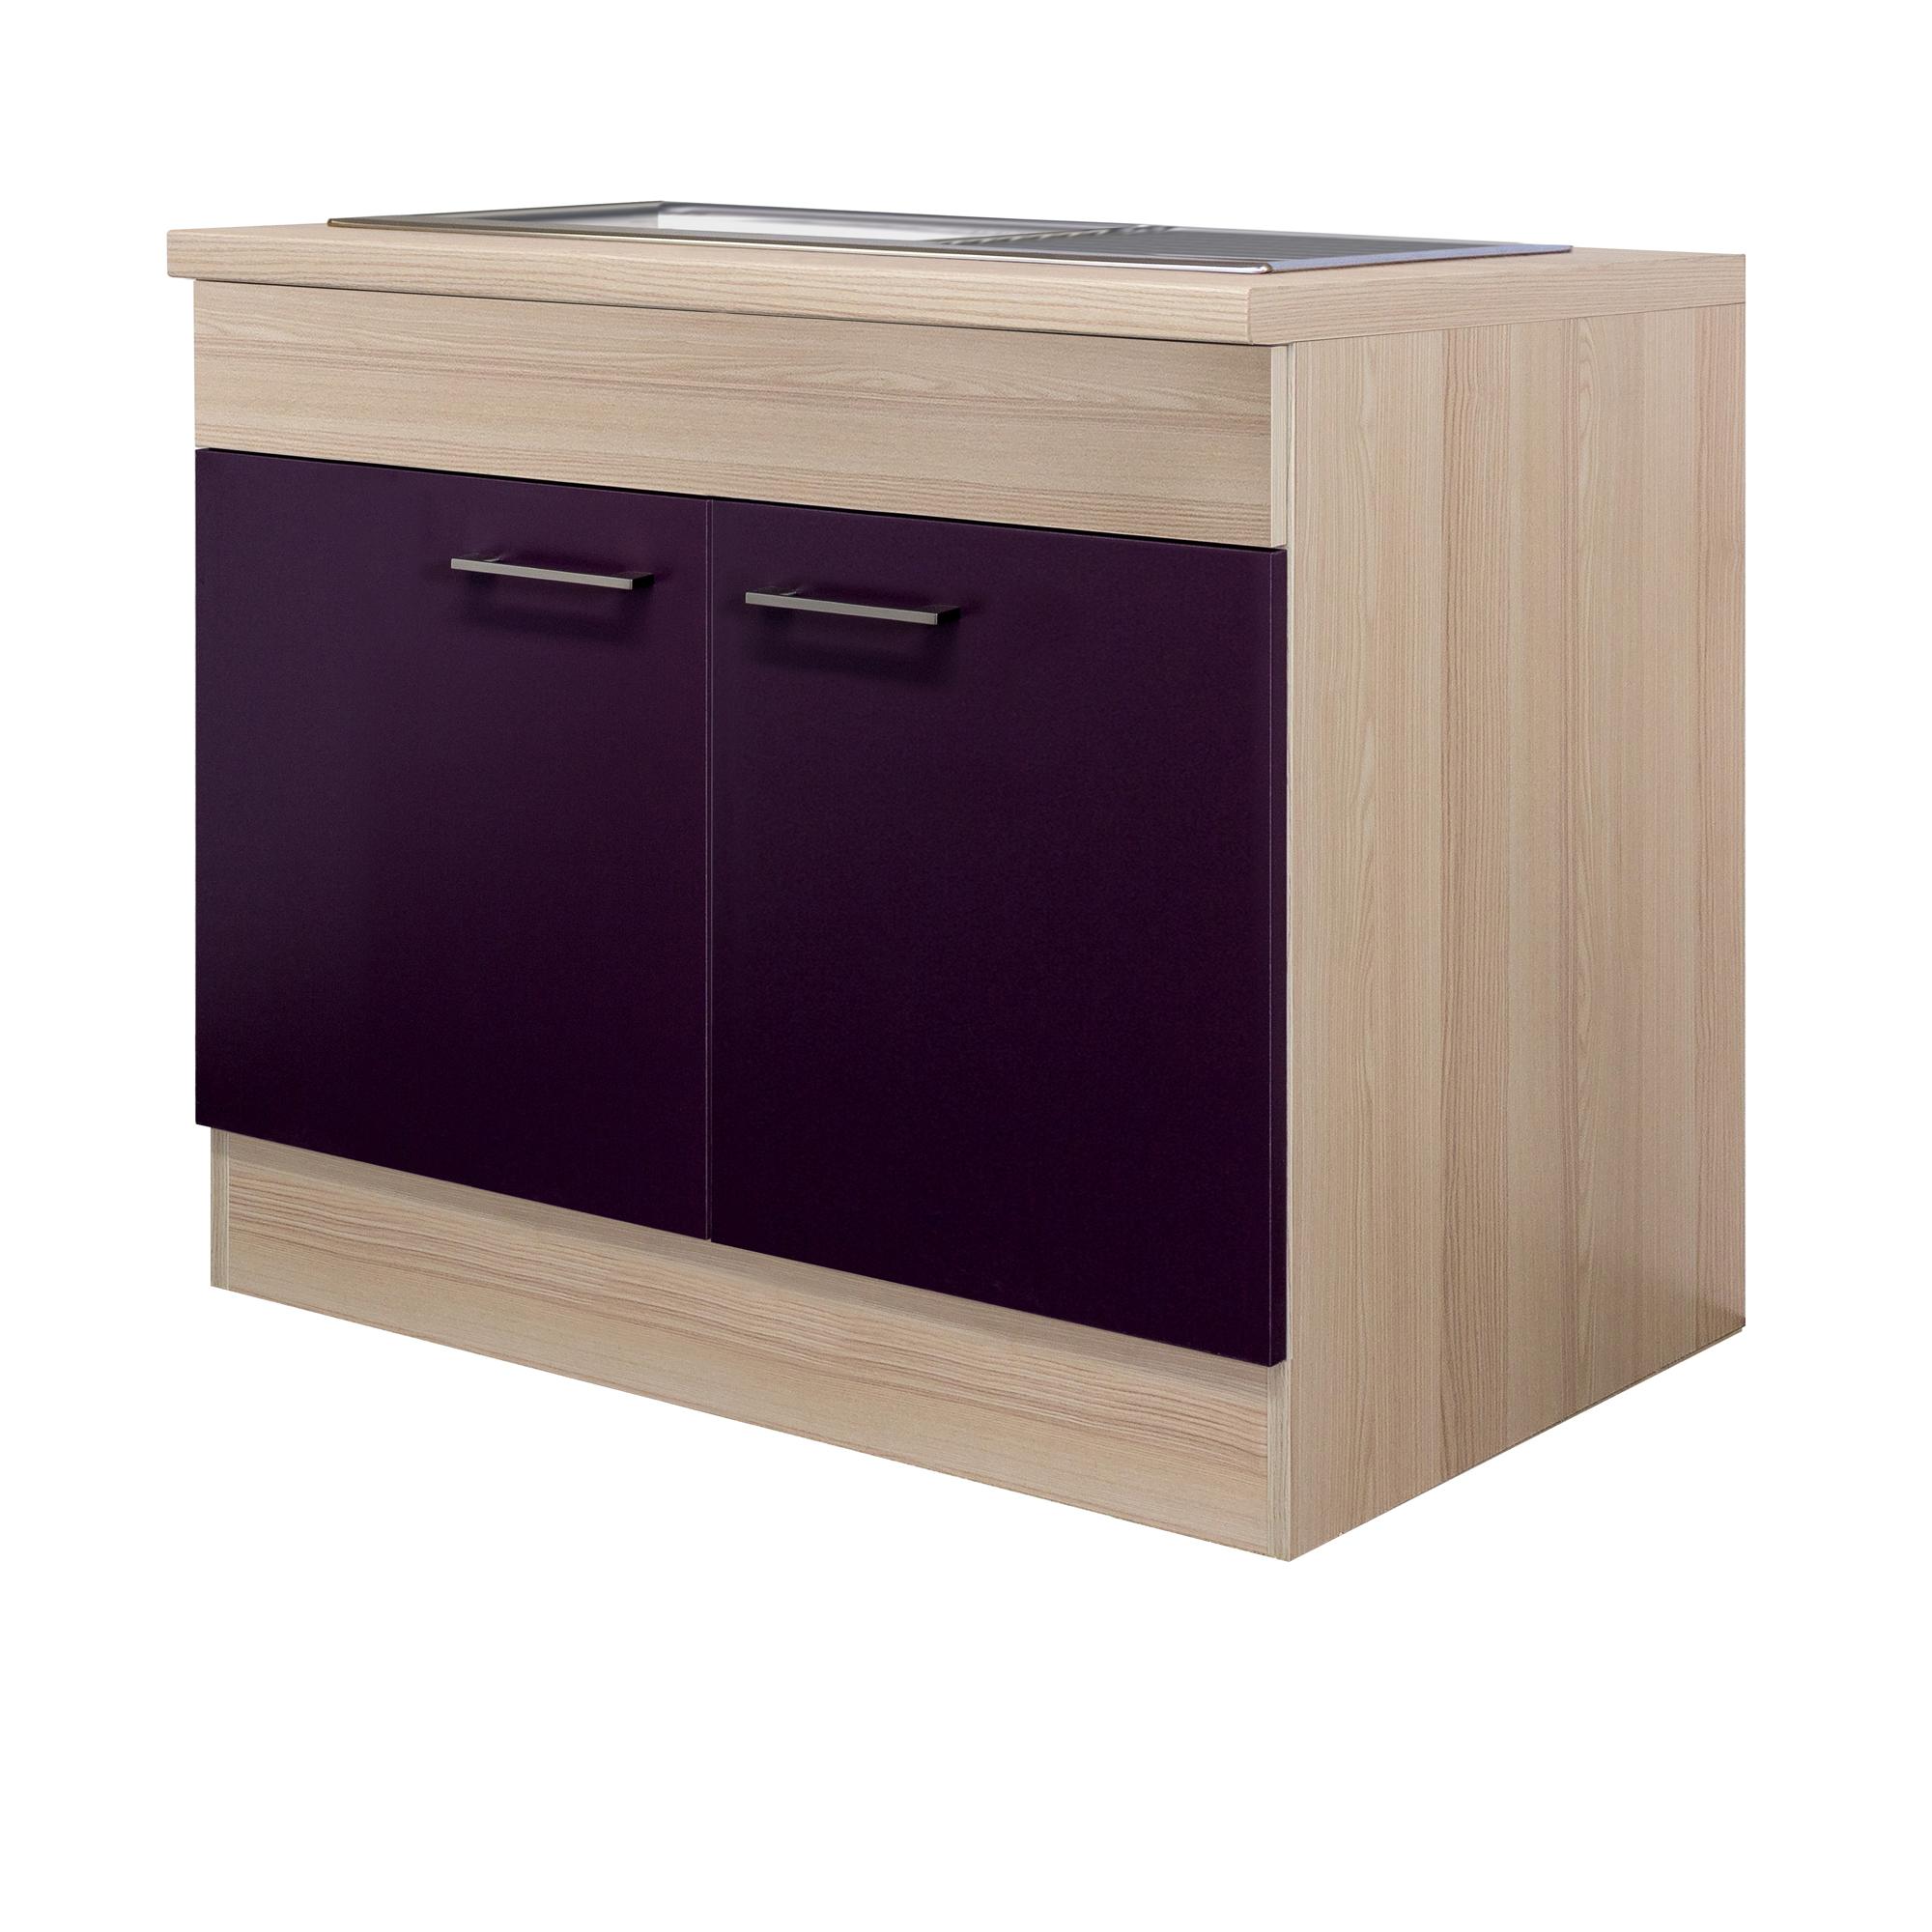 k chen sp lenschrank focus 2 t rig 100 cm breit aubergine k che sp lenschr nke. Black Bedroom Furniture Sets. Home Design Ideas